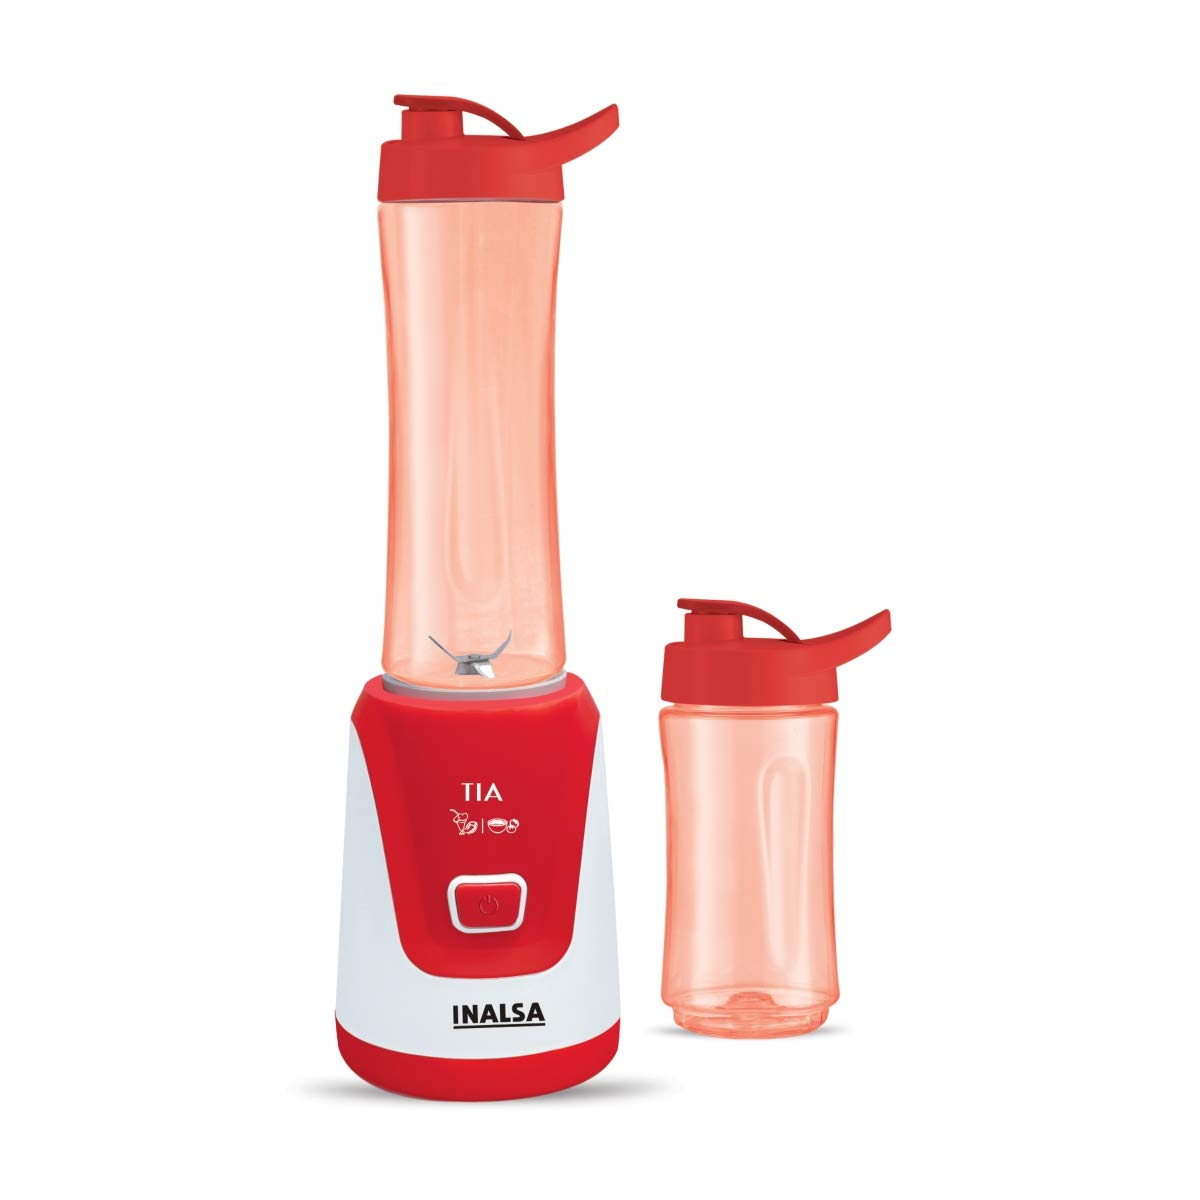 Inalsa Nutri-Blender Tia-300Watt With 2 Sip Bottles, (Red/White